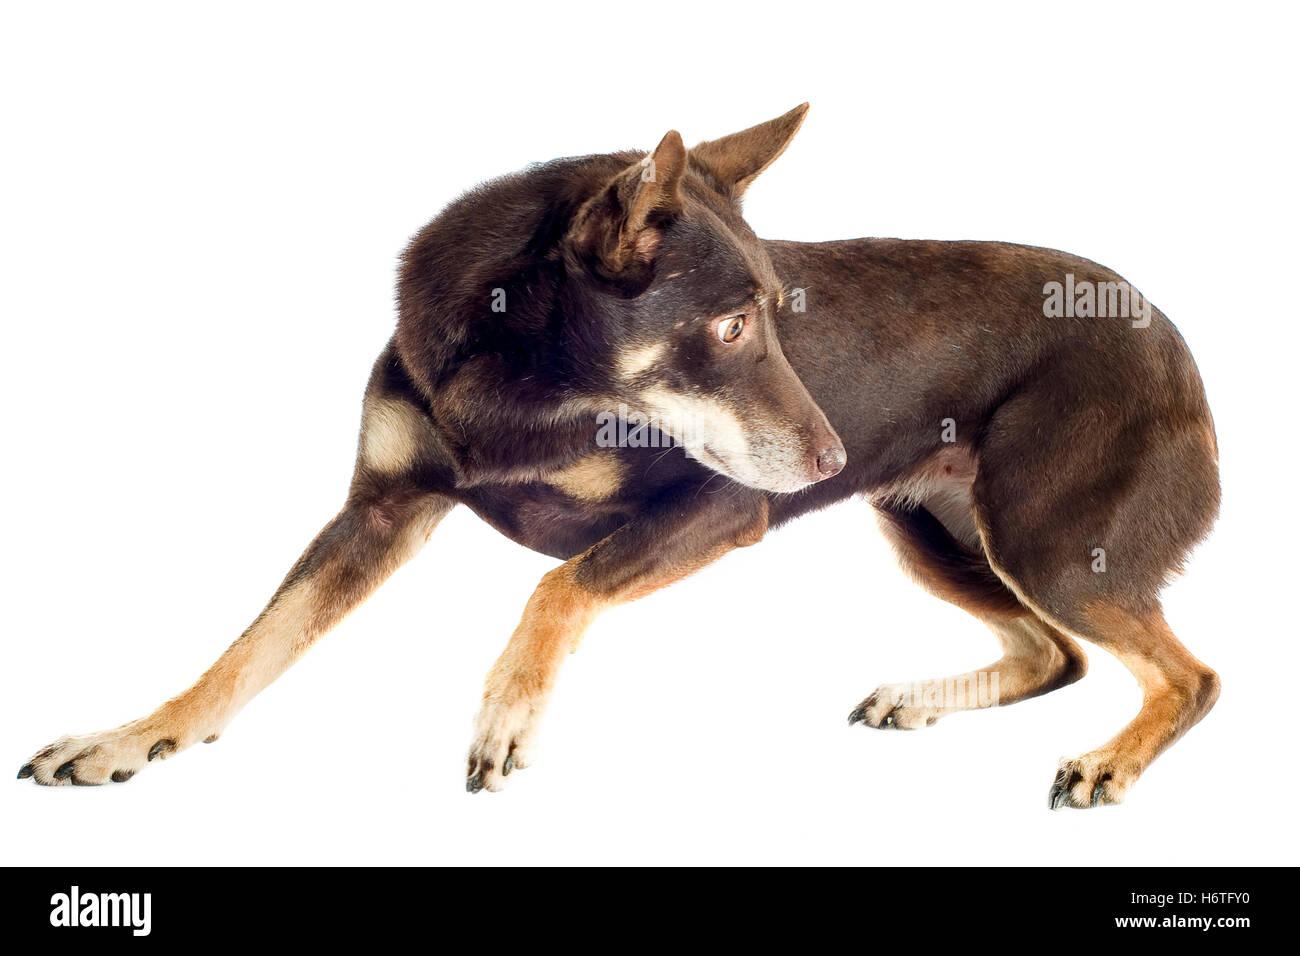 dog, australian, animal, pet, brown, brownish, brunette, look, glancing, see, - Stock Image